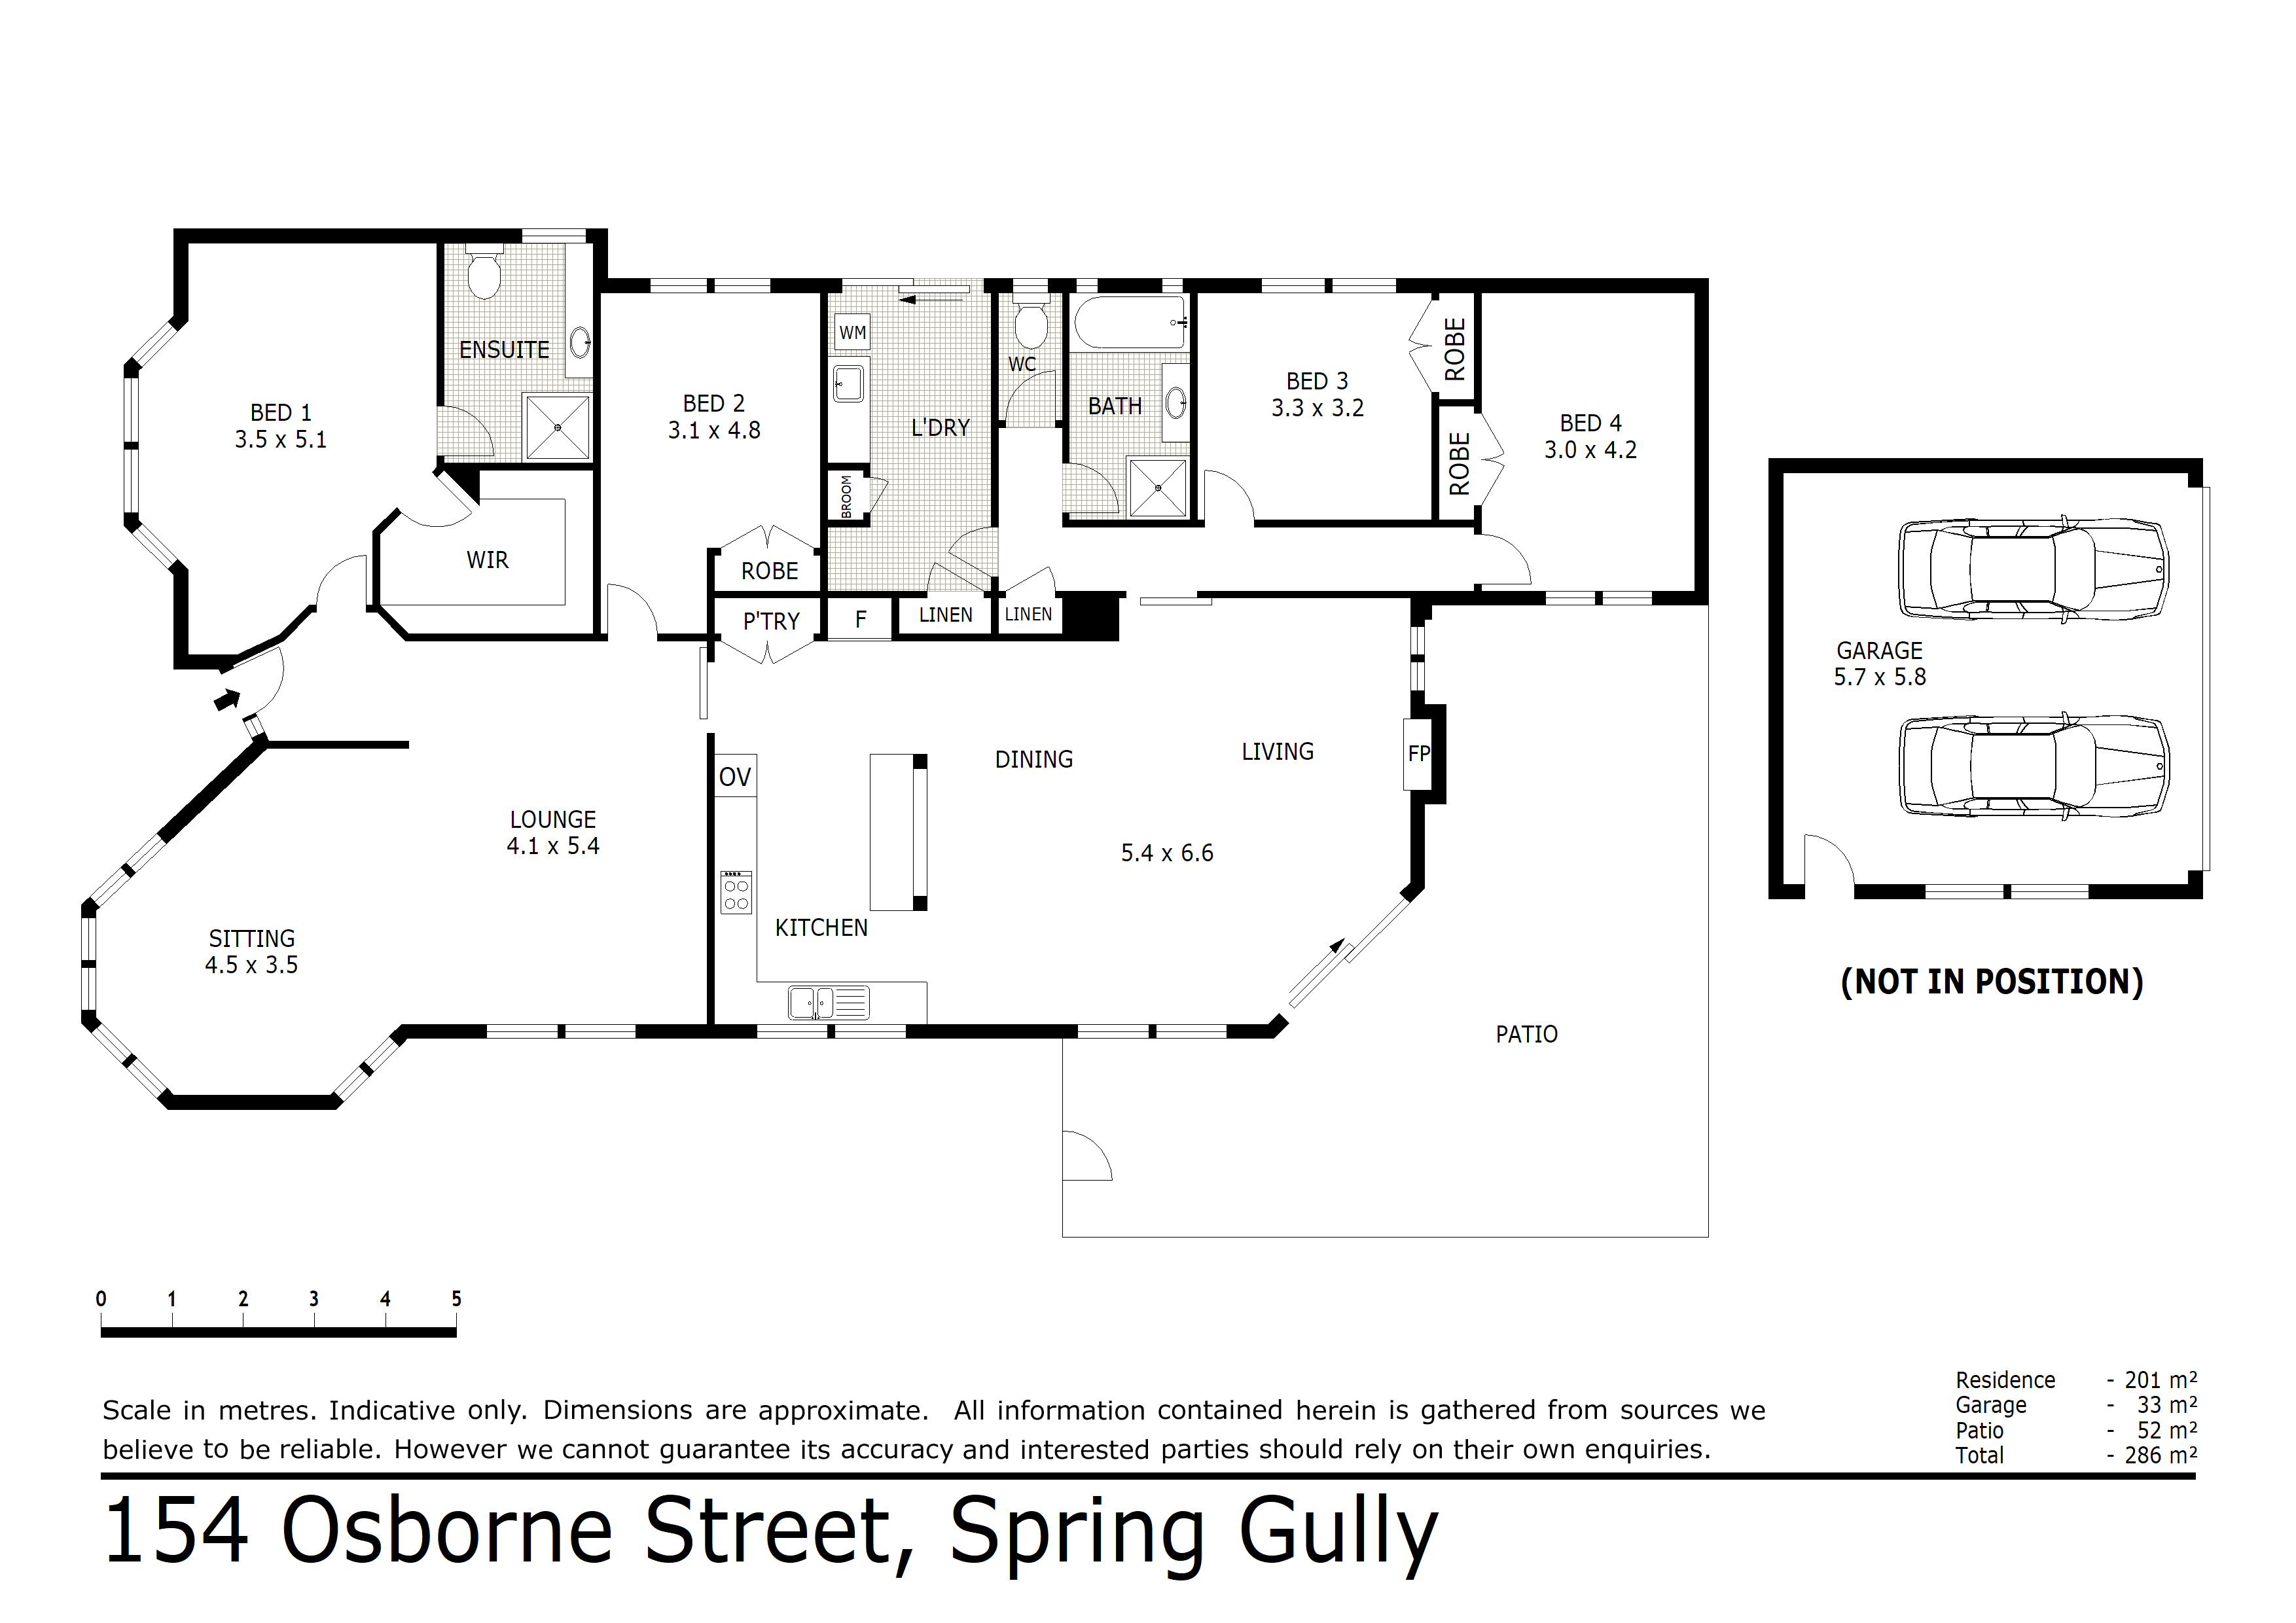 154 Osborne Street, Spring Gully, VIC 3550